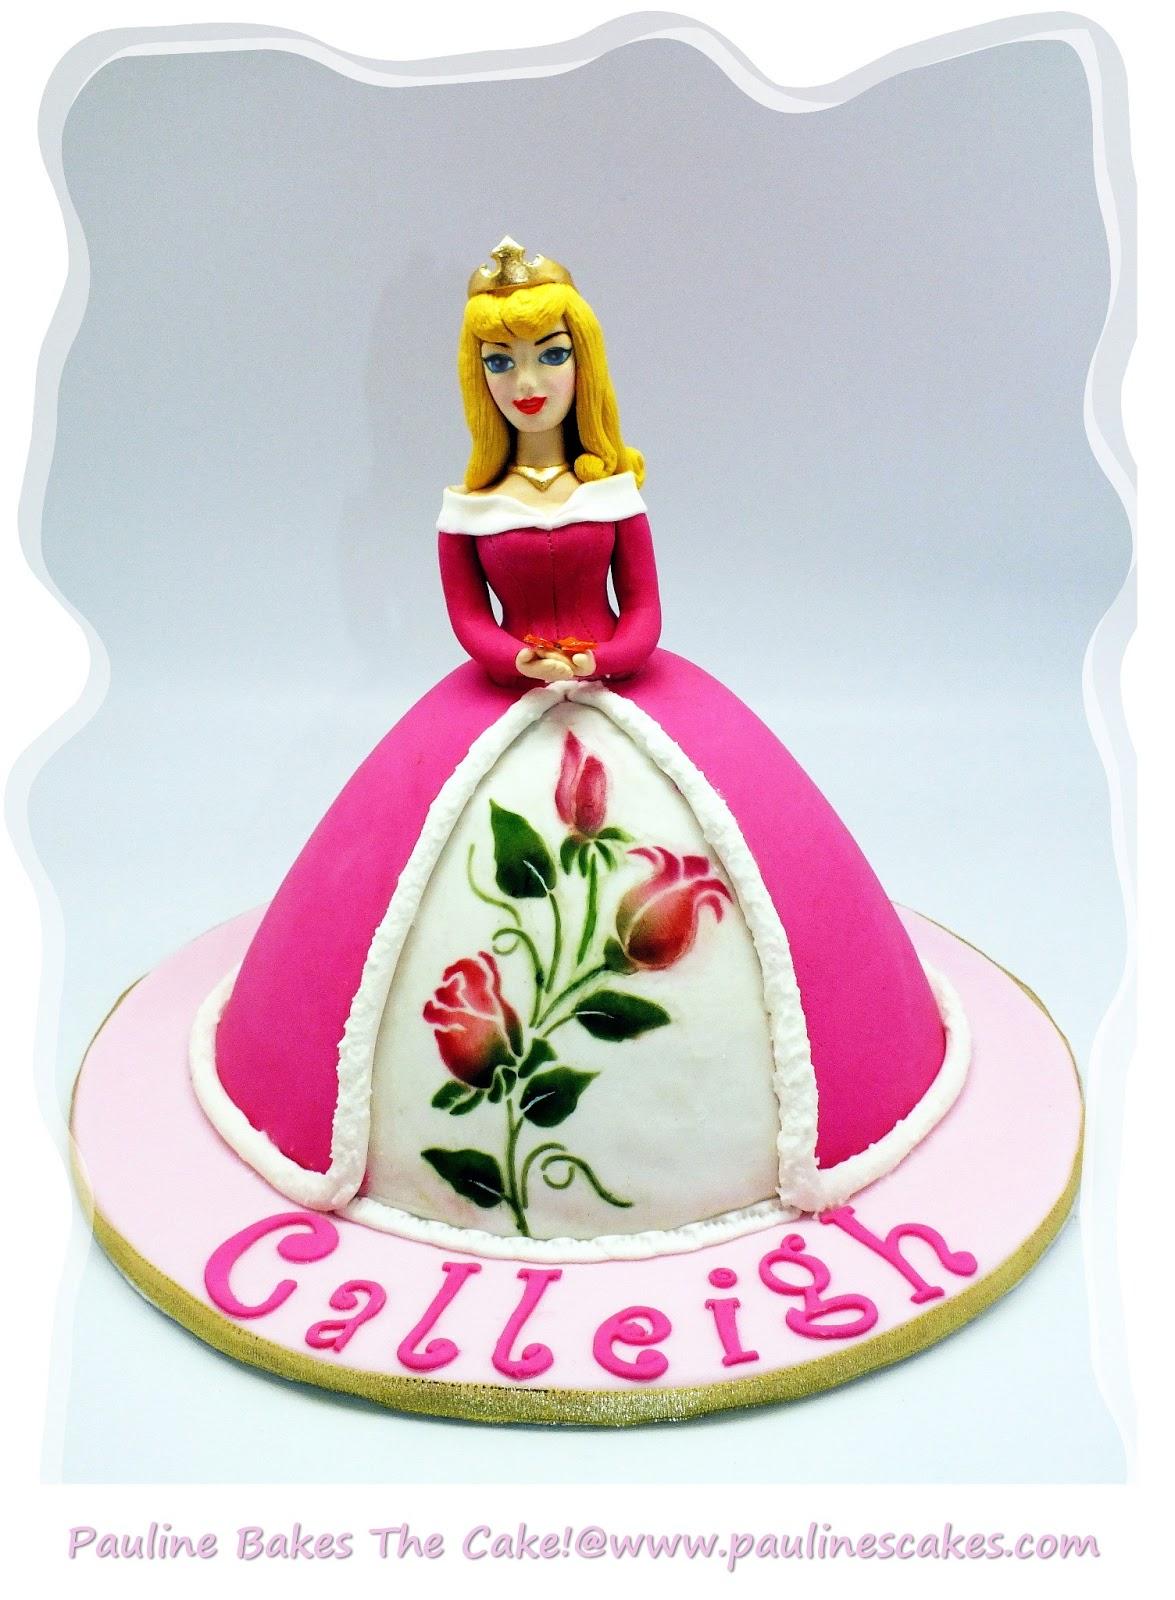 Pauline Bakes The Cake Princess Aurora The Sleeping Beauty Awakens